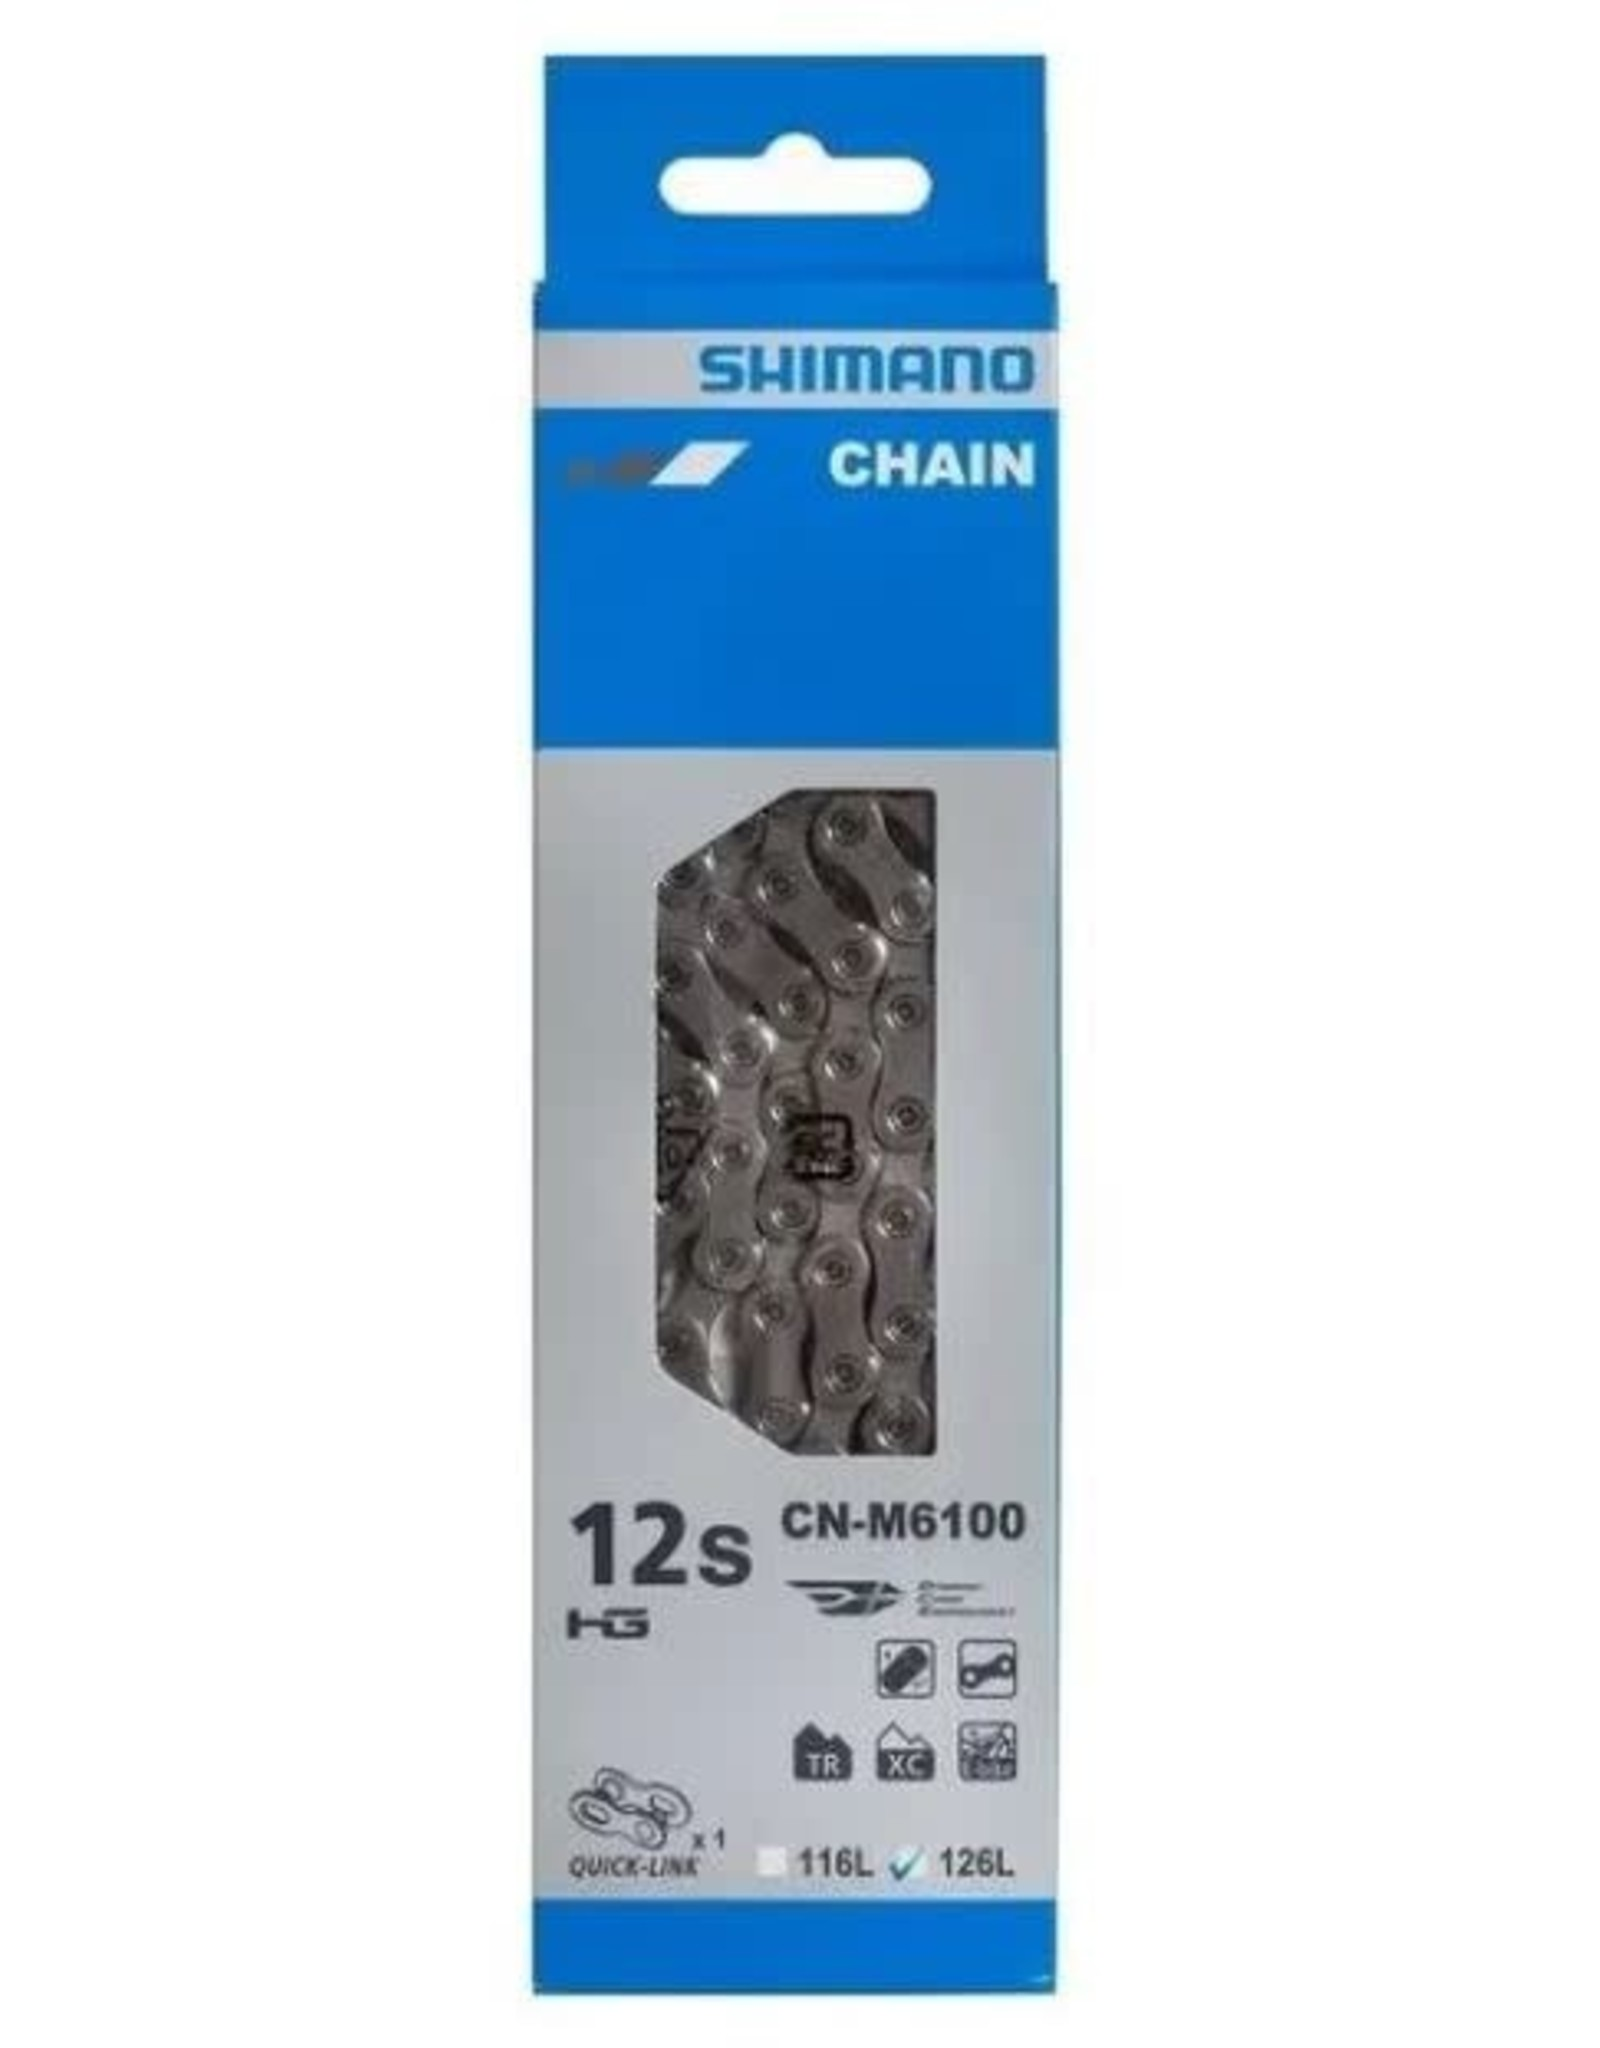 Shimano Chain Shimano M6100 Deore 12s 126 links